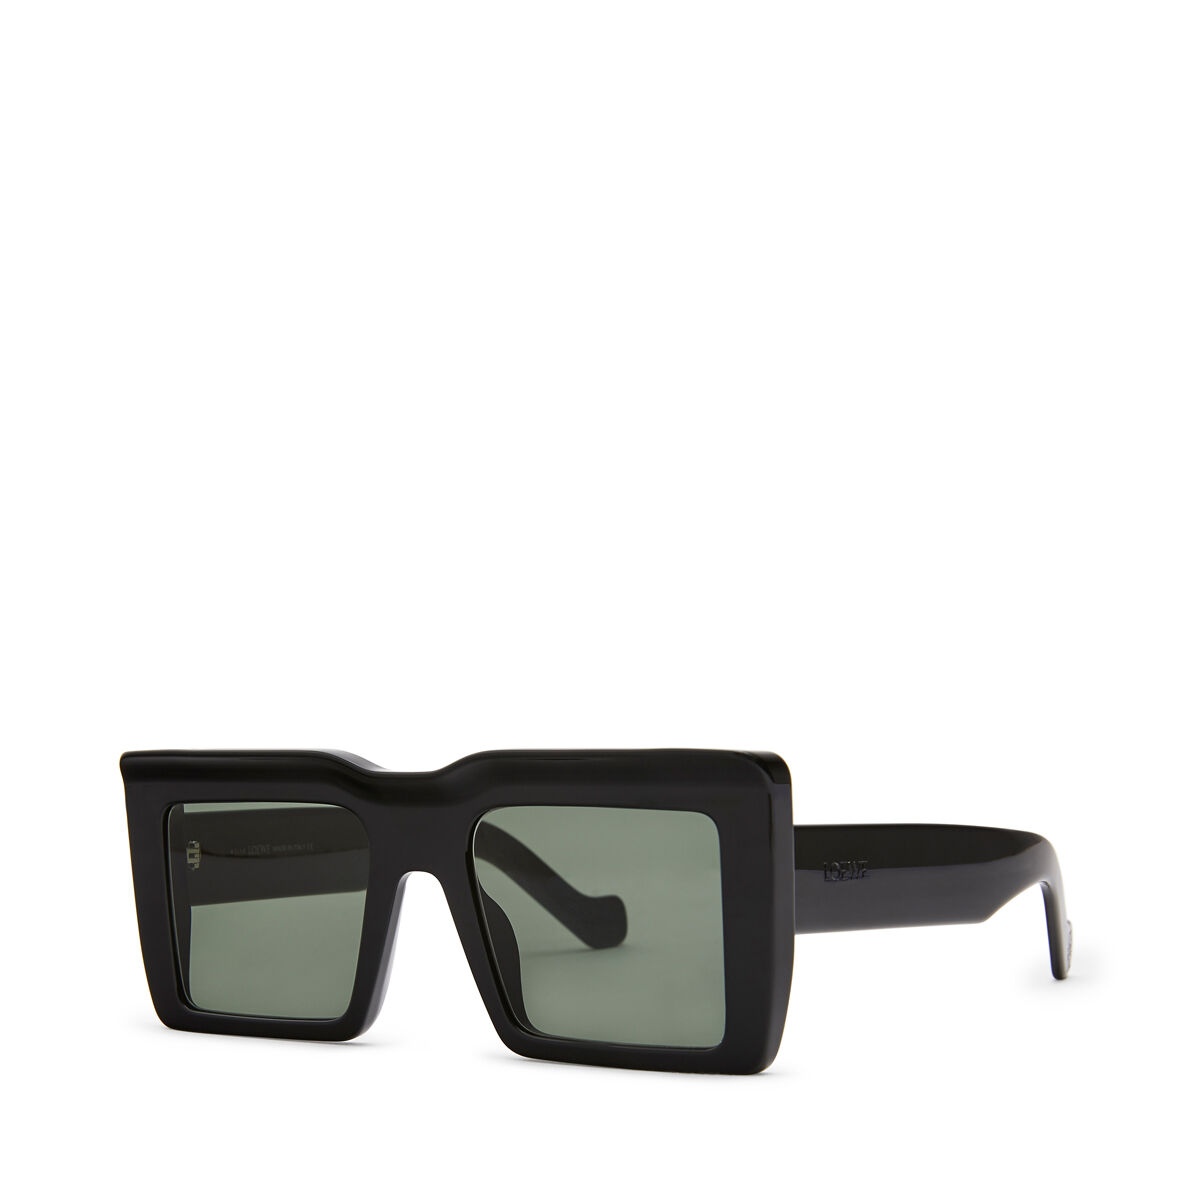 LOEWE Oversize Square Sunglasses Black front